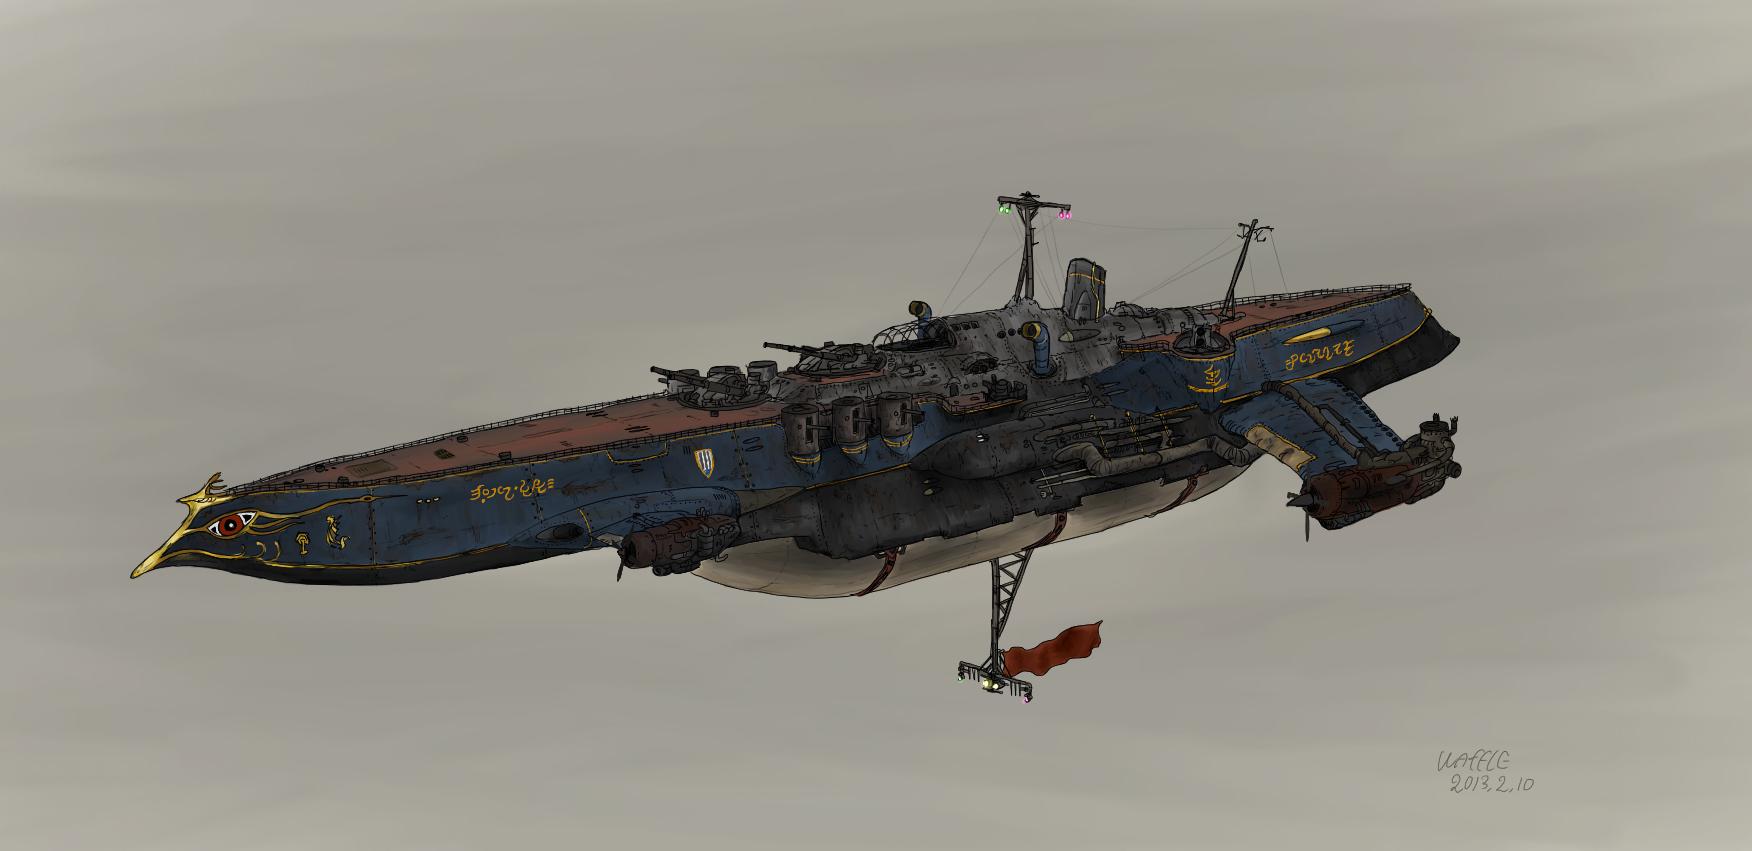 Armed aerial steamship Cygnet by Waffle0708